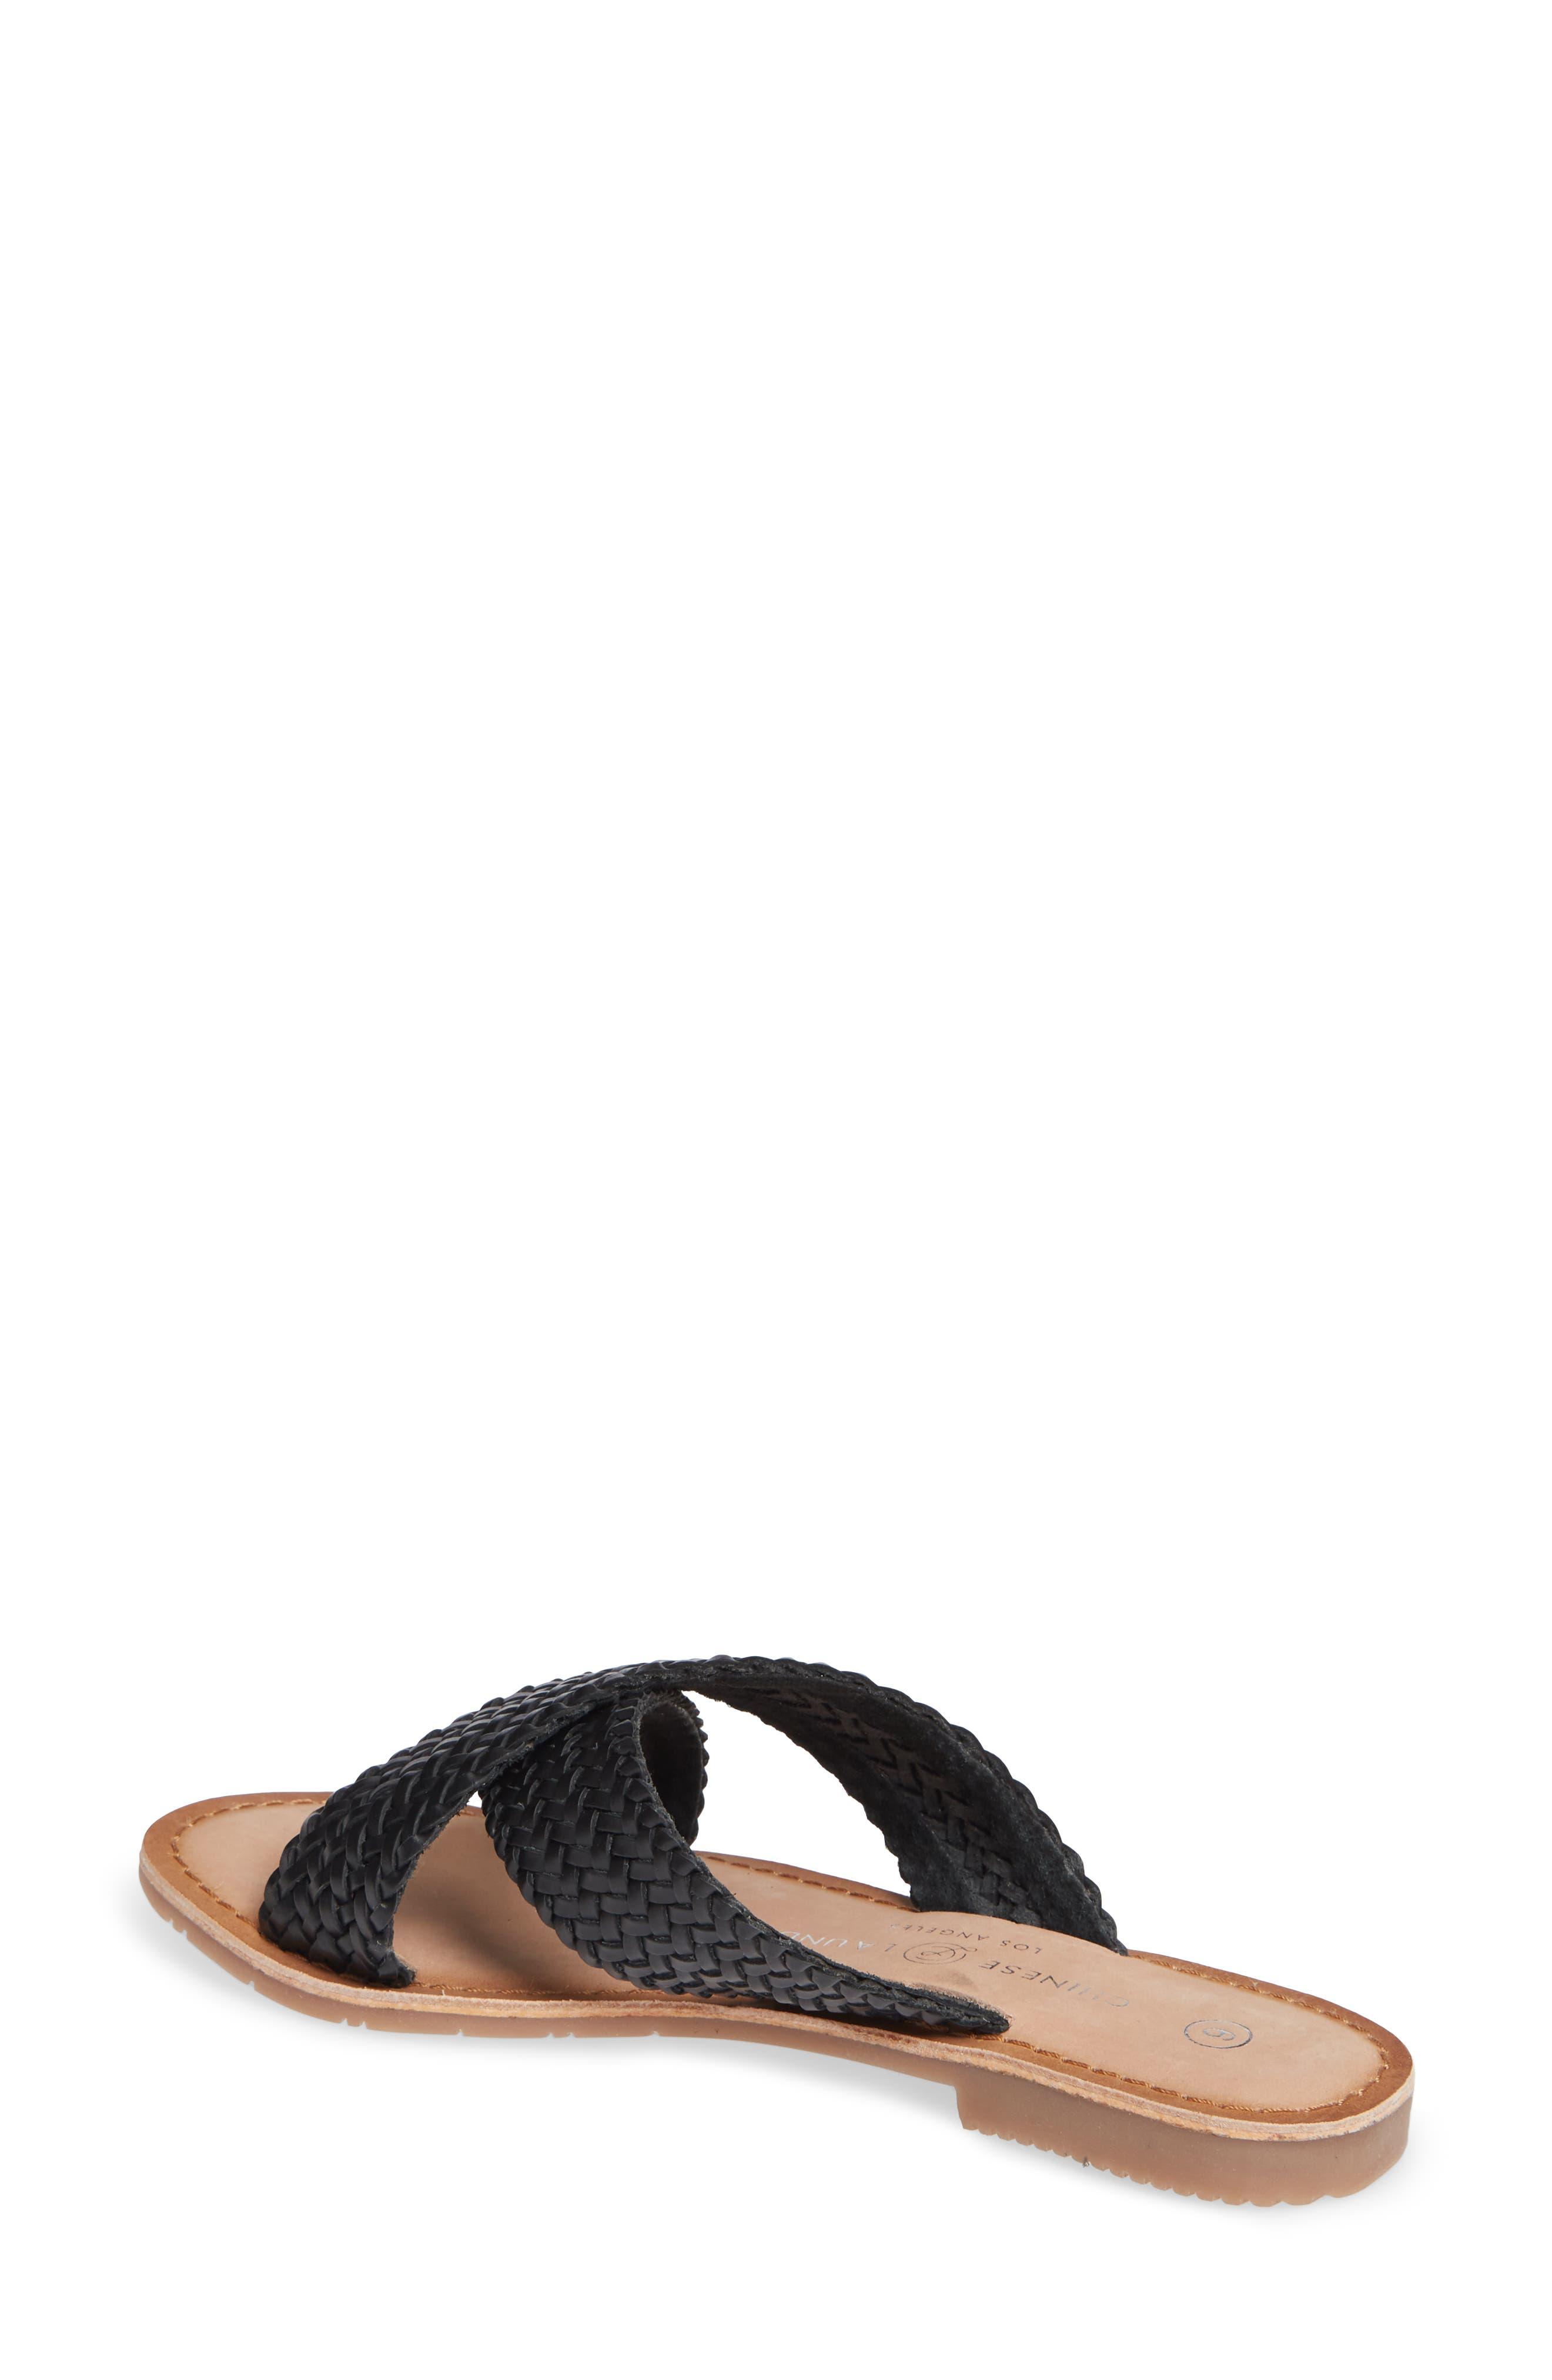 Pure Woven Slide Sandal,                             Alternate thumbnail 2, color,                             BLACK LEATHER